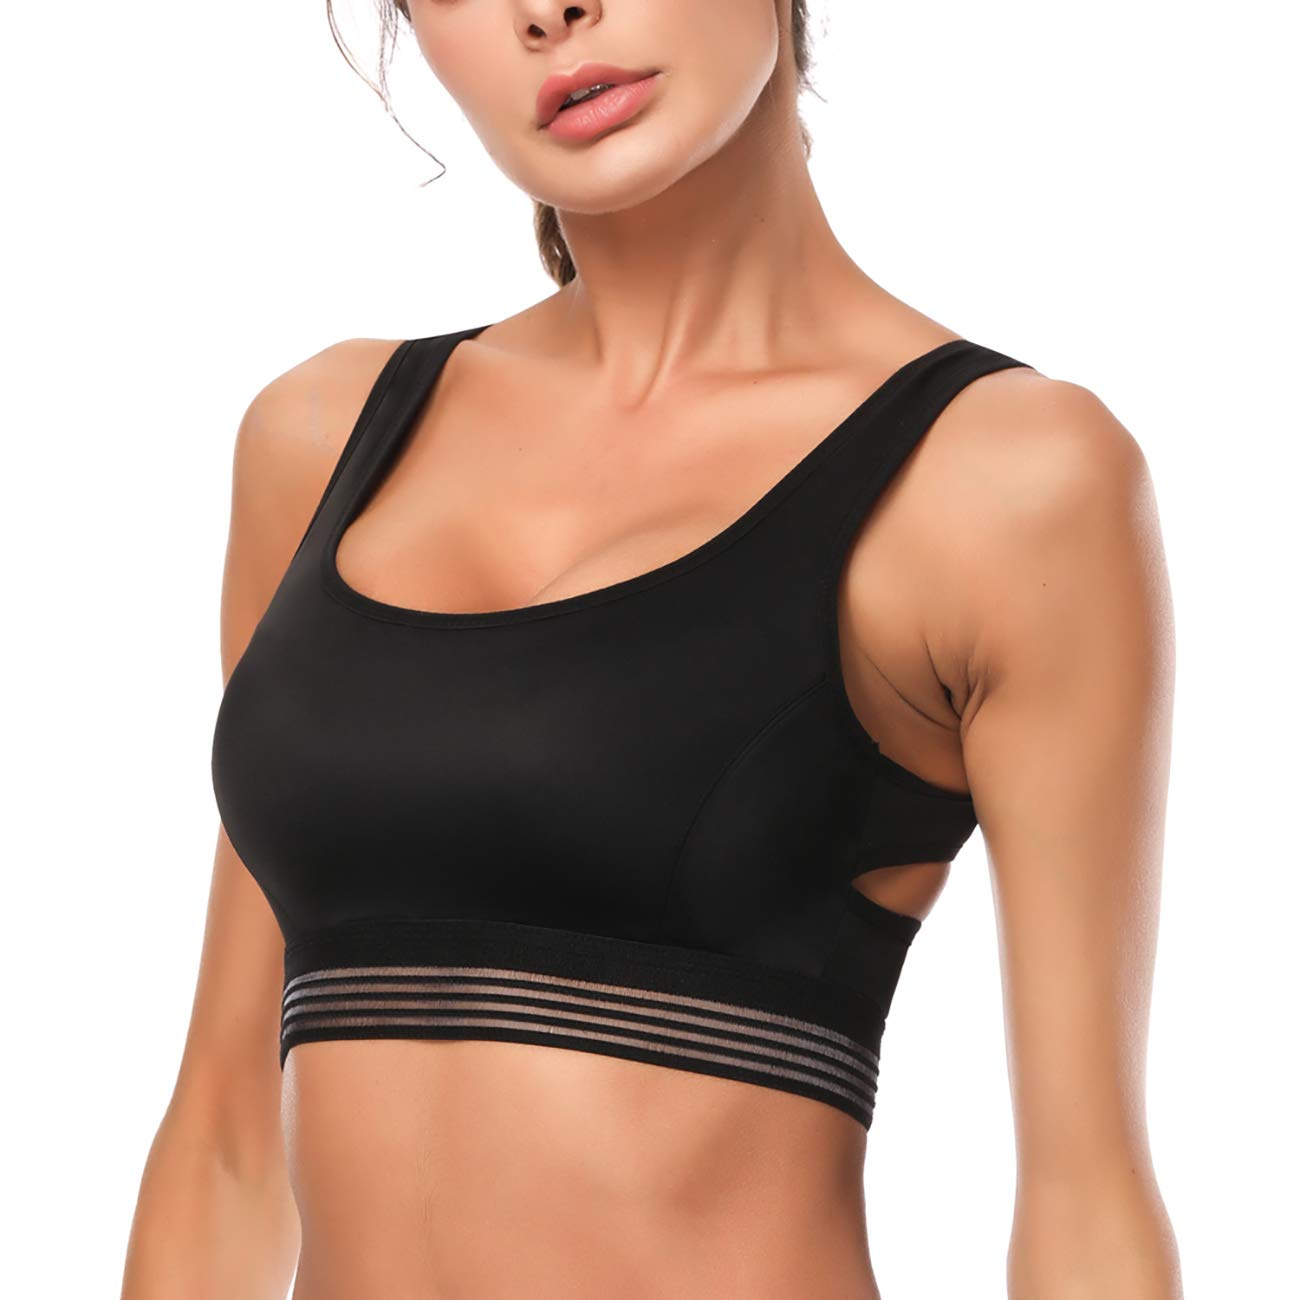 Kamier Sports Bra Padded for Gym Workout Activewear Yoga Running Bra(Black,Large)